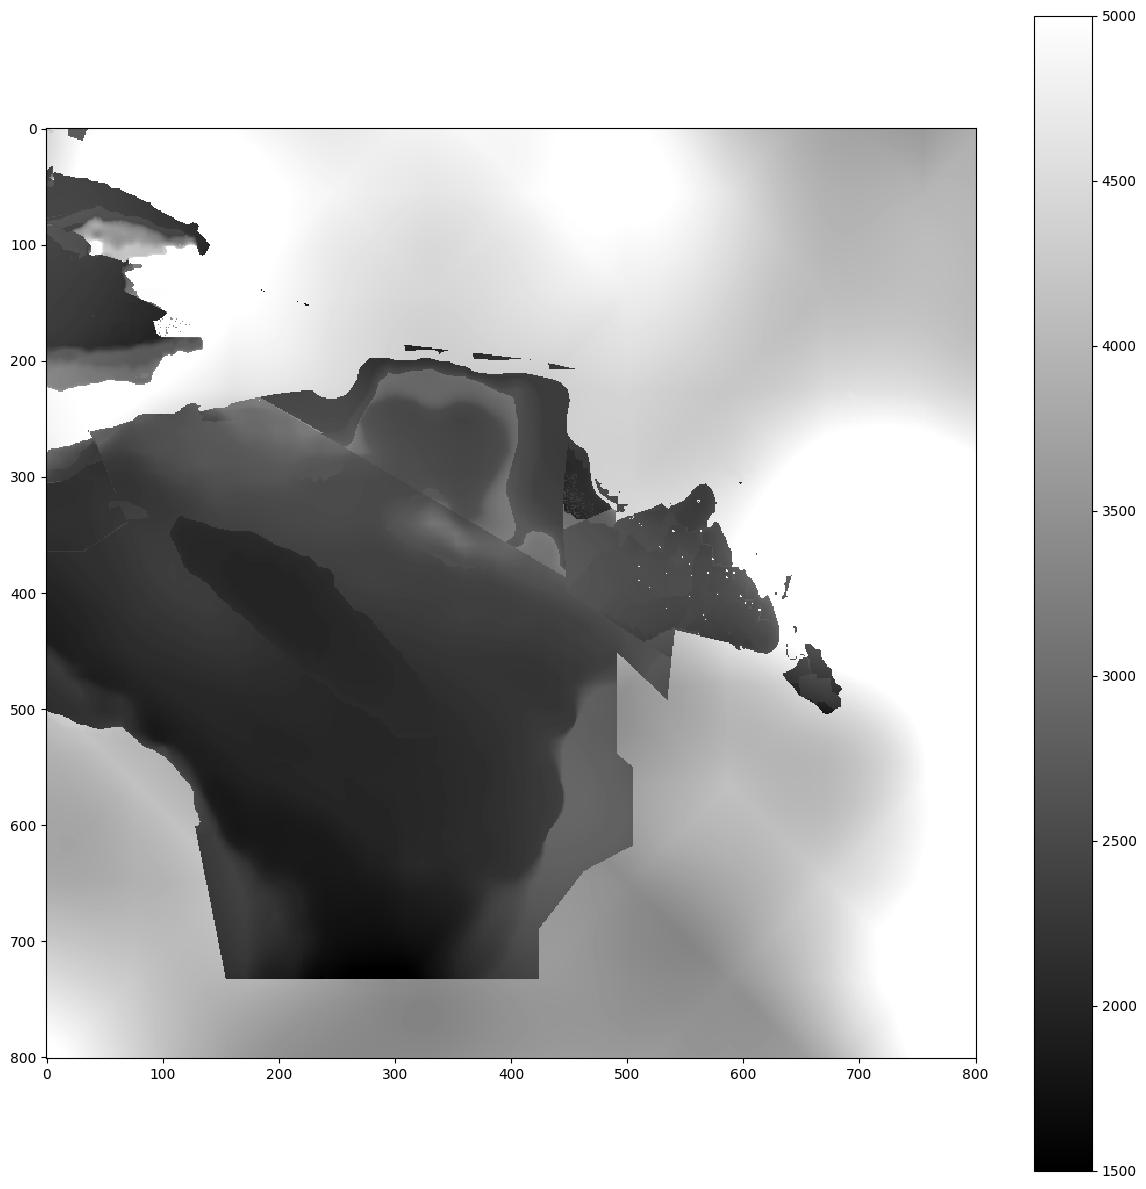 bench/seismic/wp/la_habra/meshes/velocity_model/plots/vp_750.png